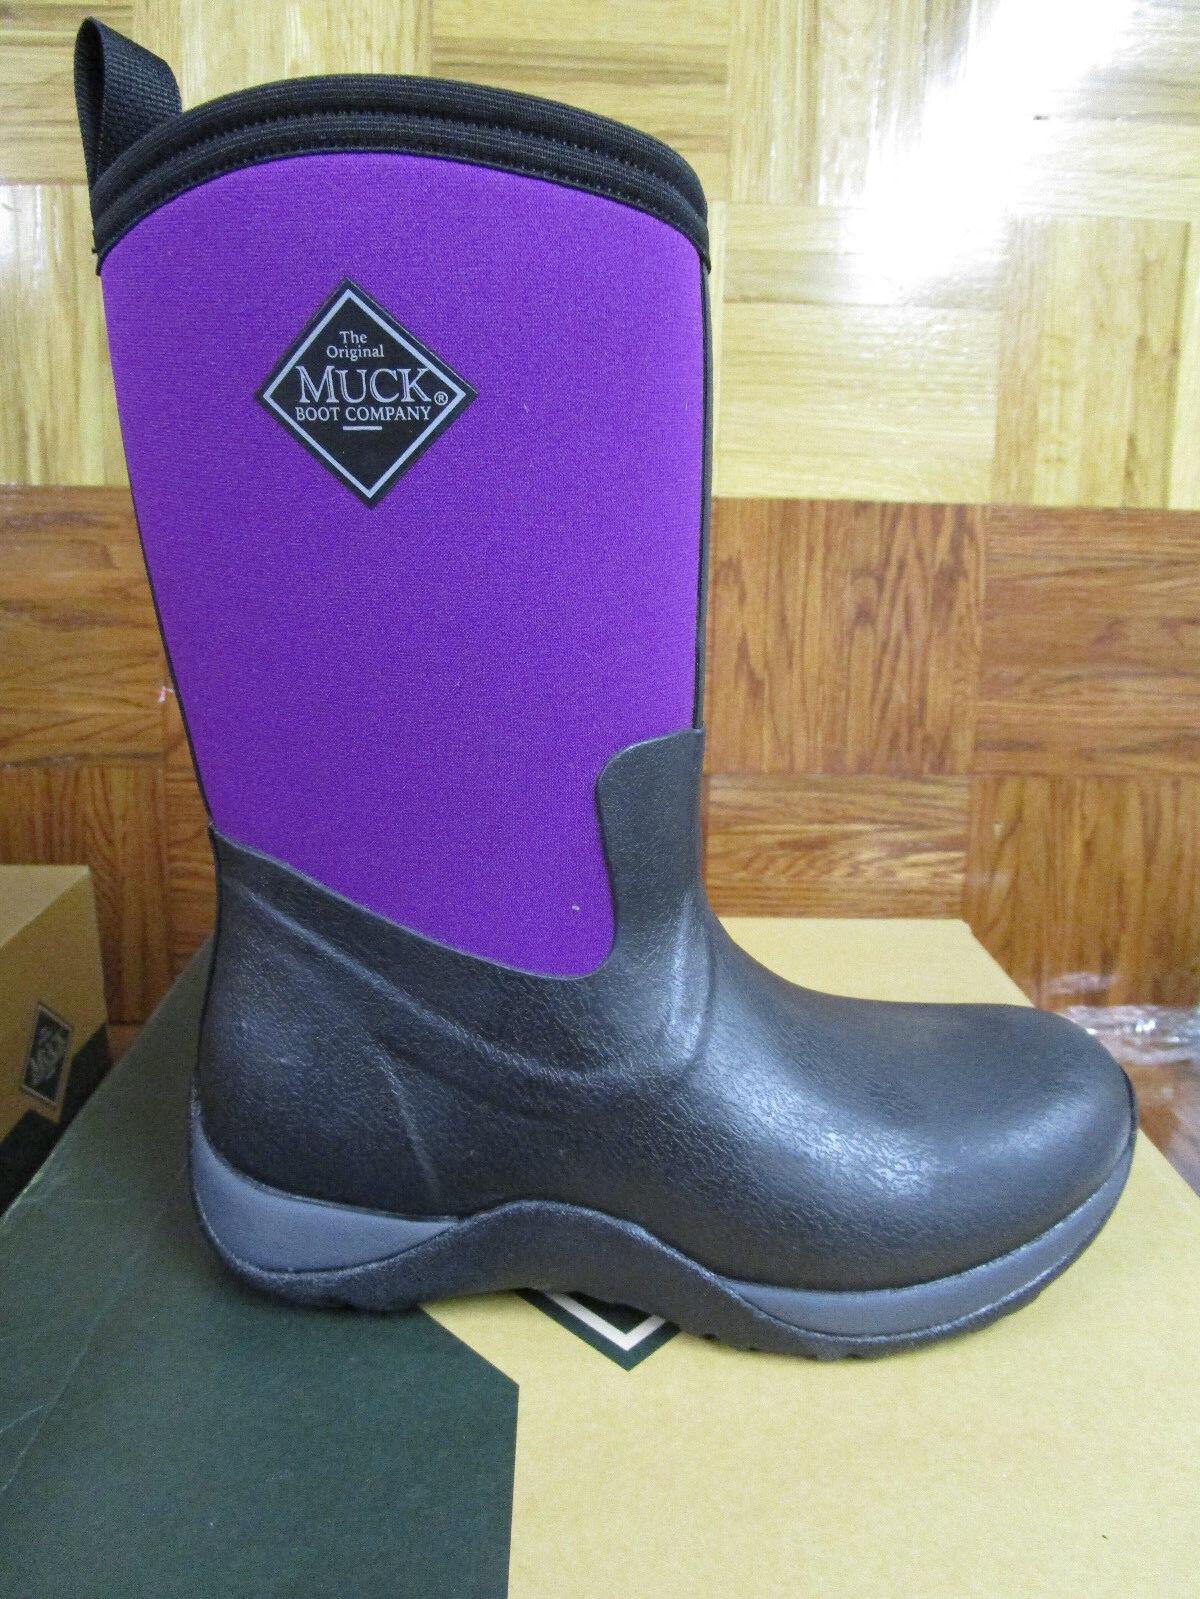 Muck botas para Mujer botas invierno ártico M fin de semana negro Musgoso Púrpura Talla 5 M ártico 4ee3d5